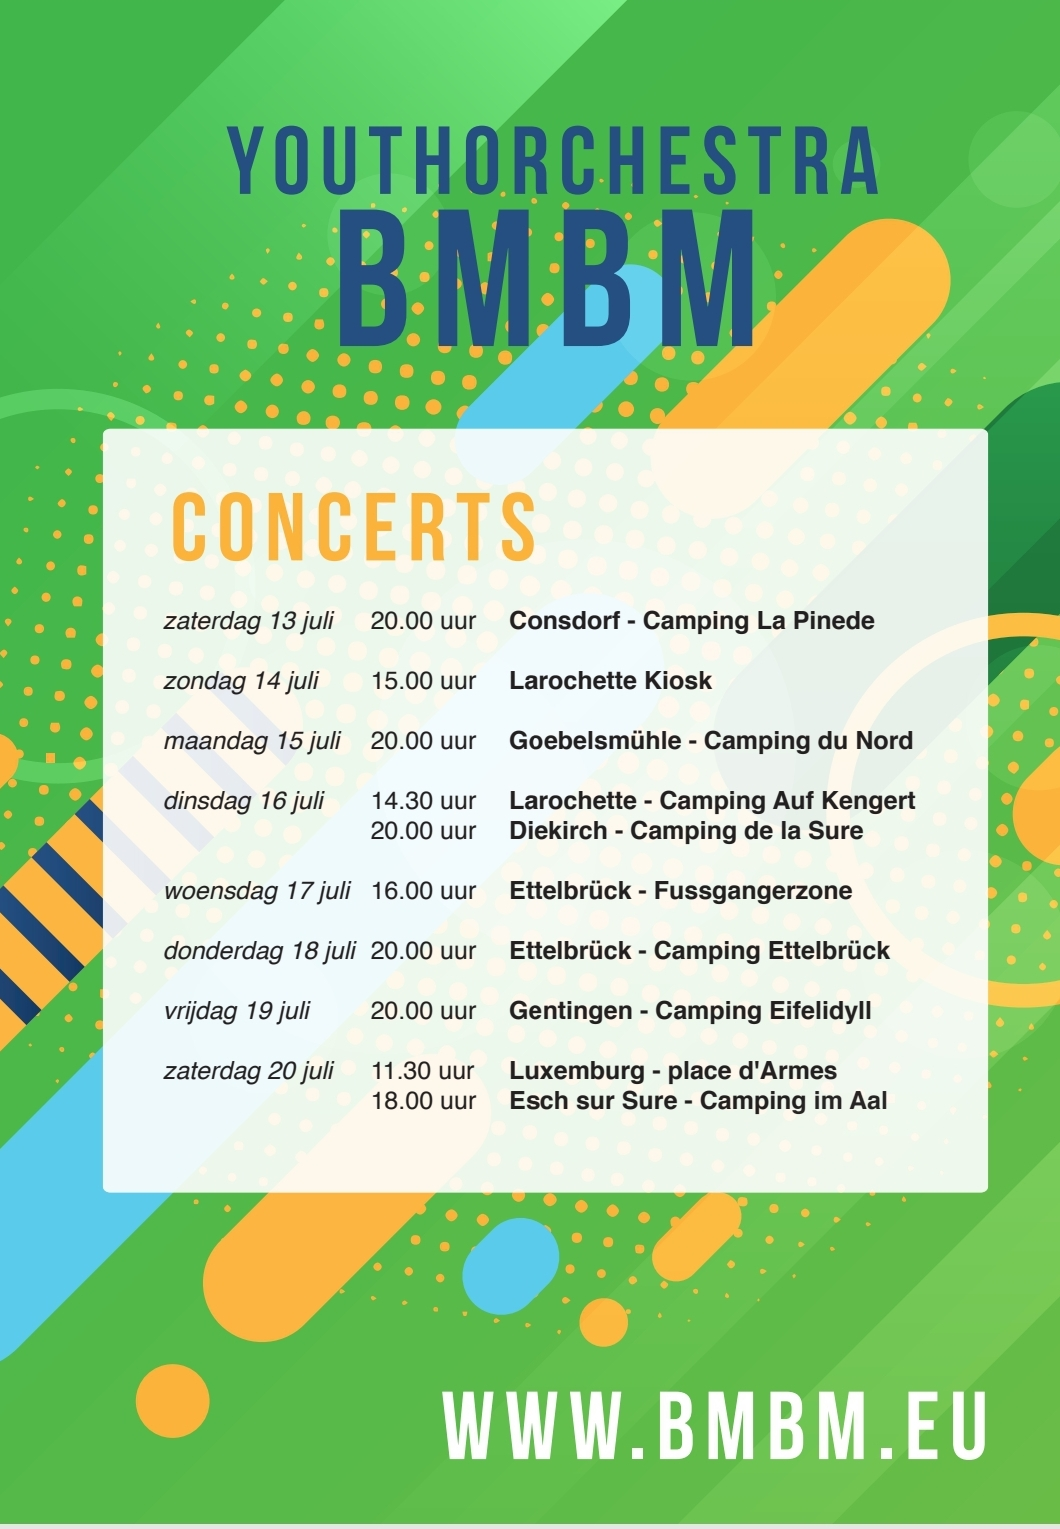 Programma concertreis Luxemburg